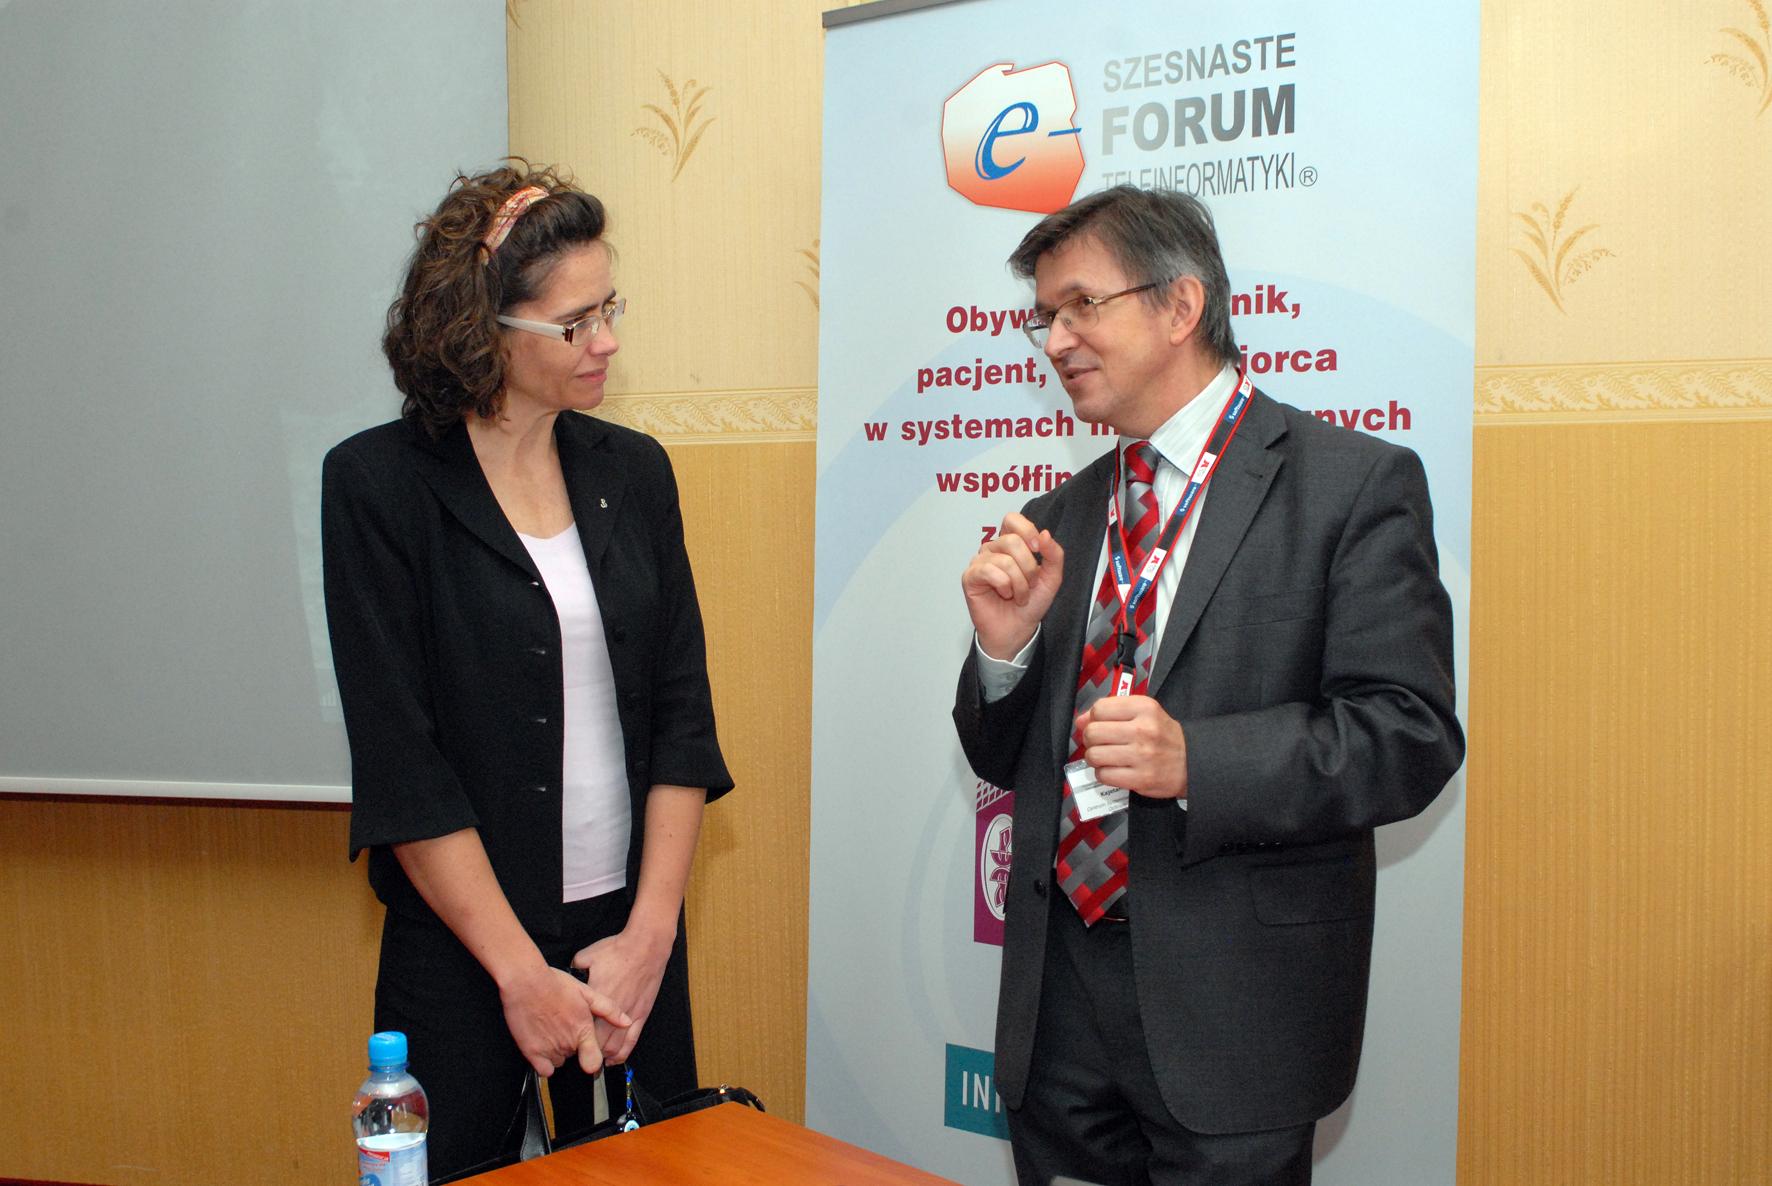 XVI Forum Teleinformatyki